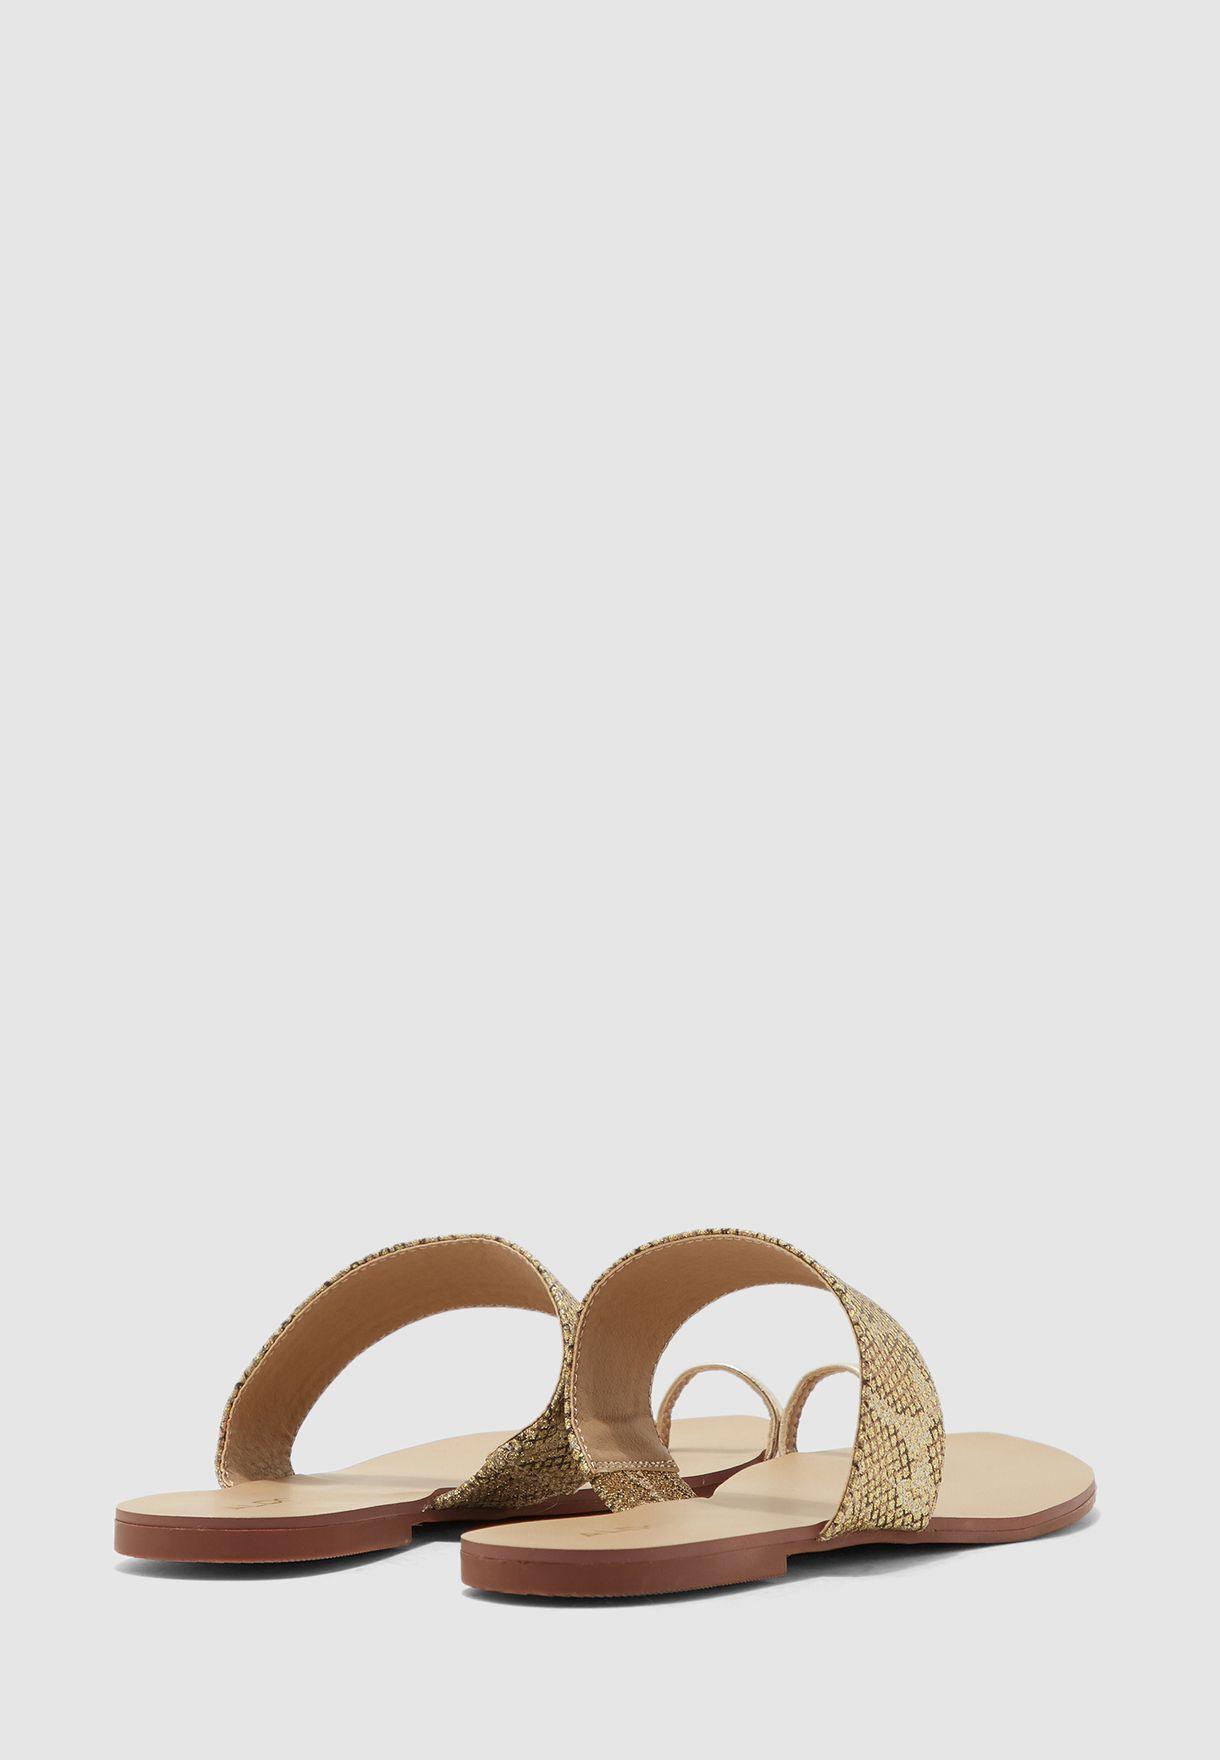 Unilmaclya Flat Sandal